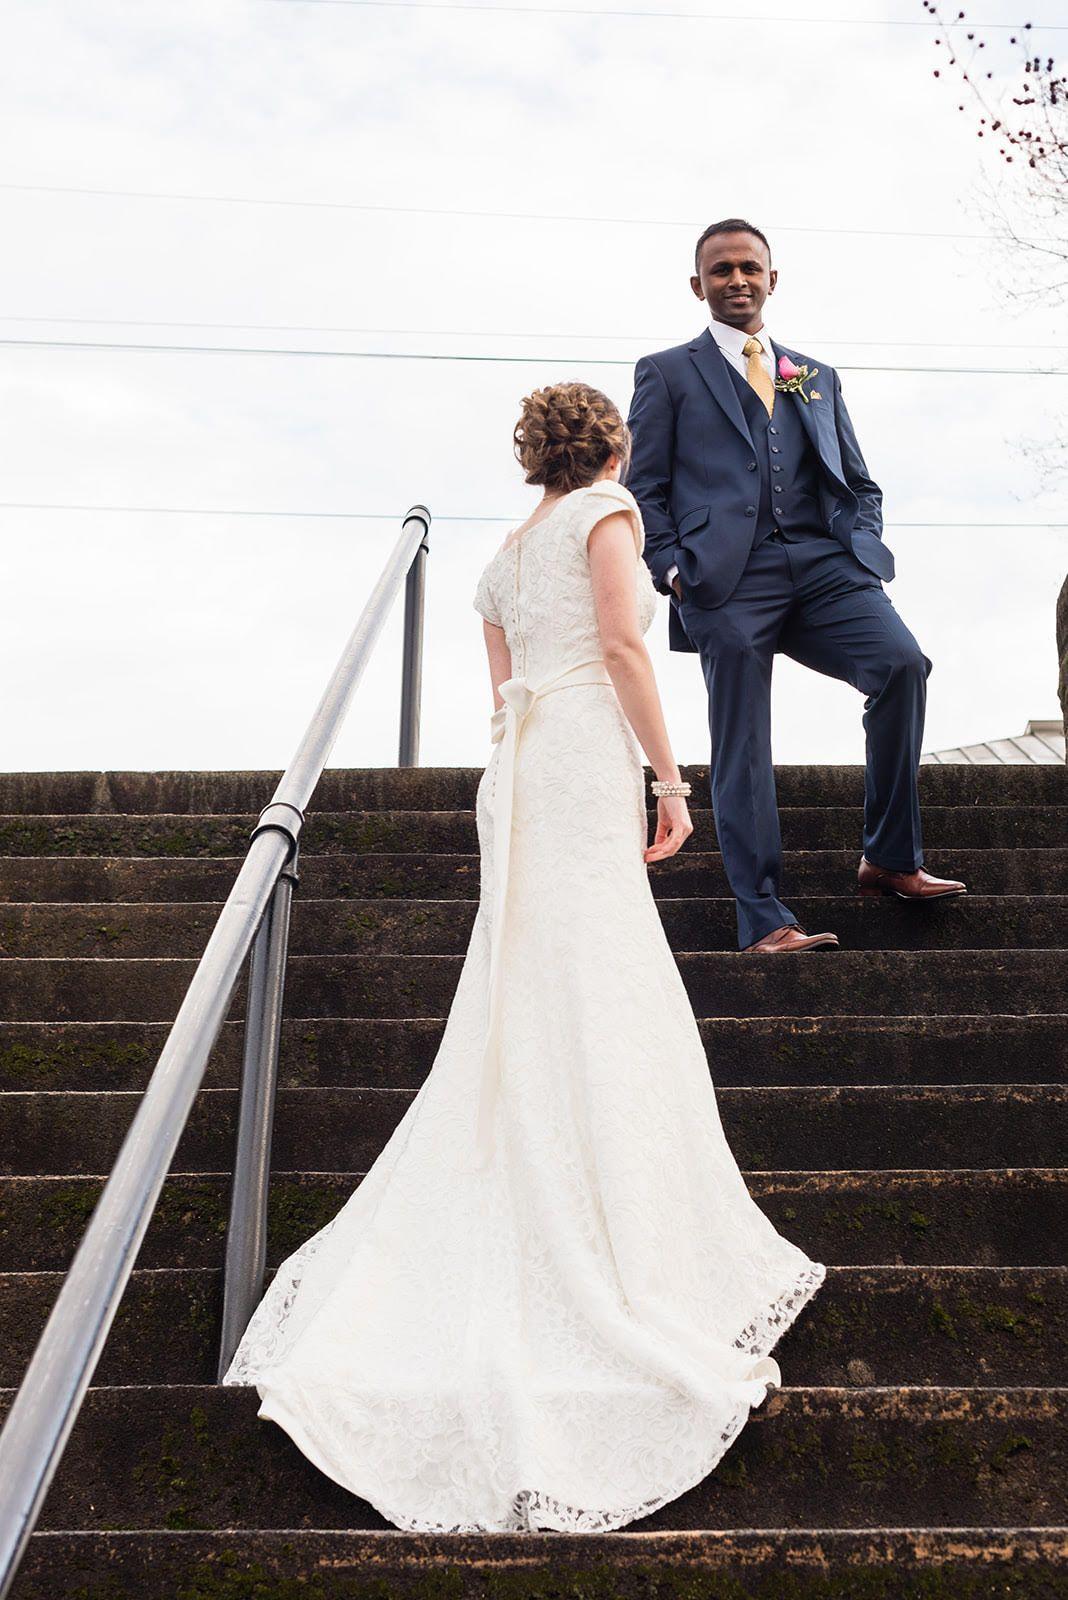 Loveland Modest Bridal Gowns Wedding Dresses Modest Wedding Dresses [ 1600 x 1068 Pixel ]